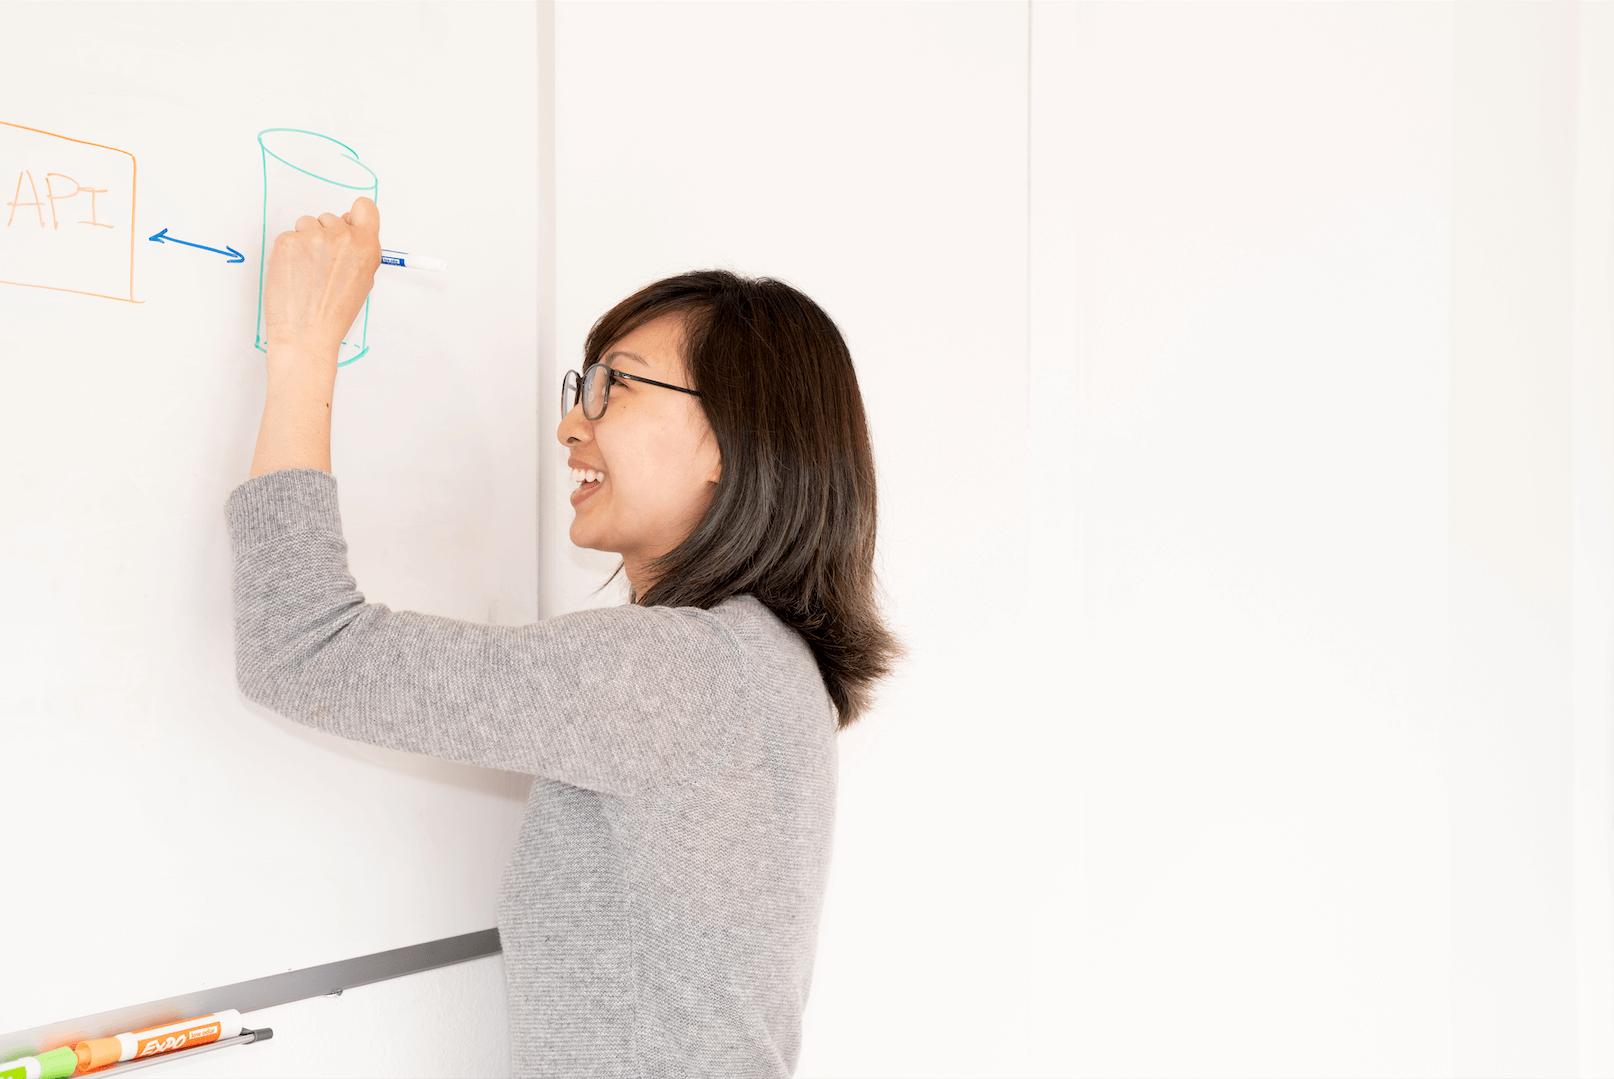 Woman draws on whiteboard